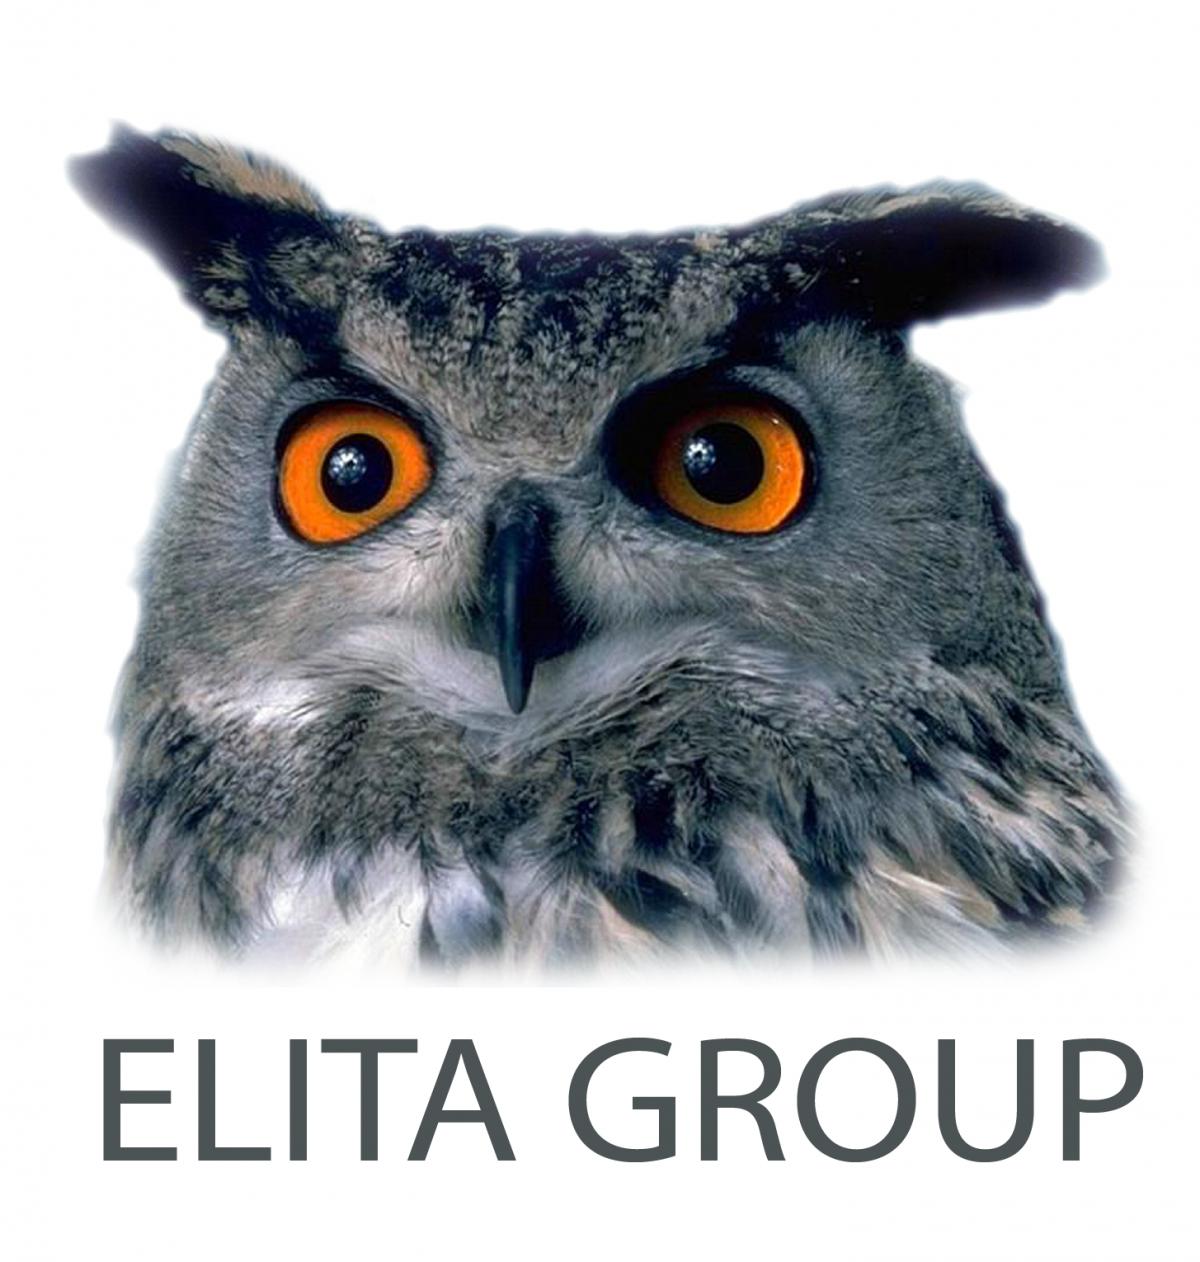 Тифлострим, № 48. «Элита групп». Компания. Техника. Люди